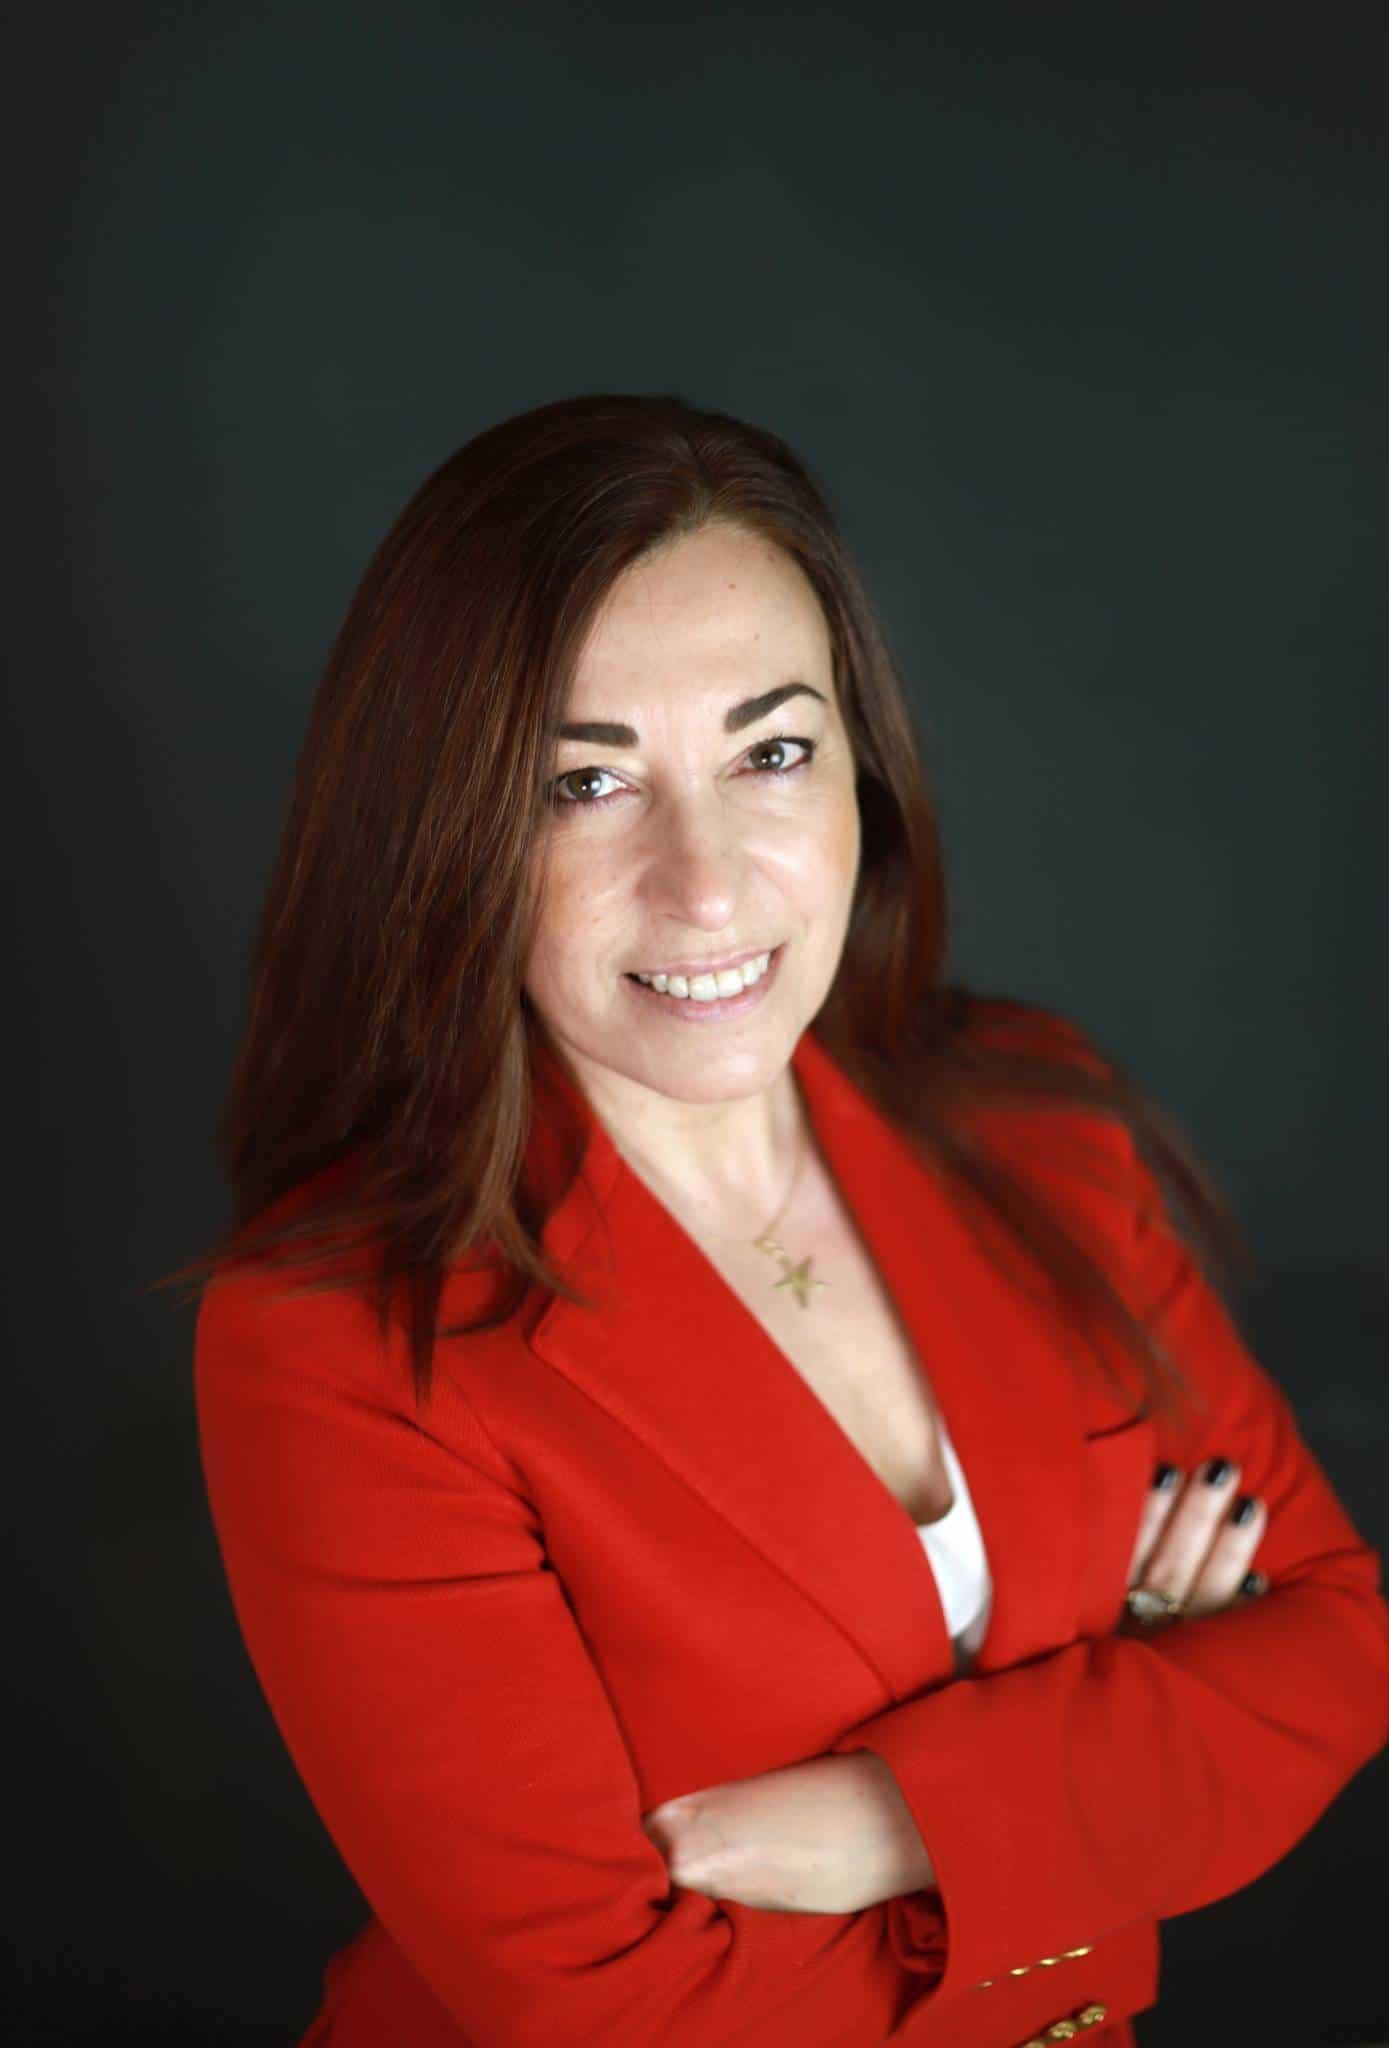 Julia Santos, Sales Manager de Dynatrace